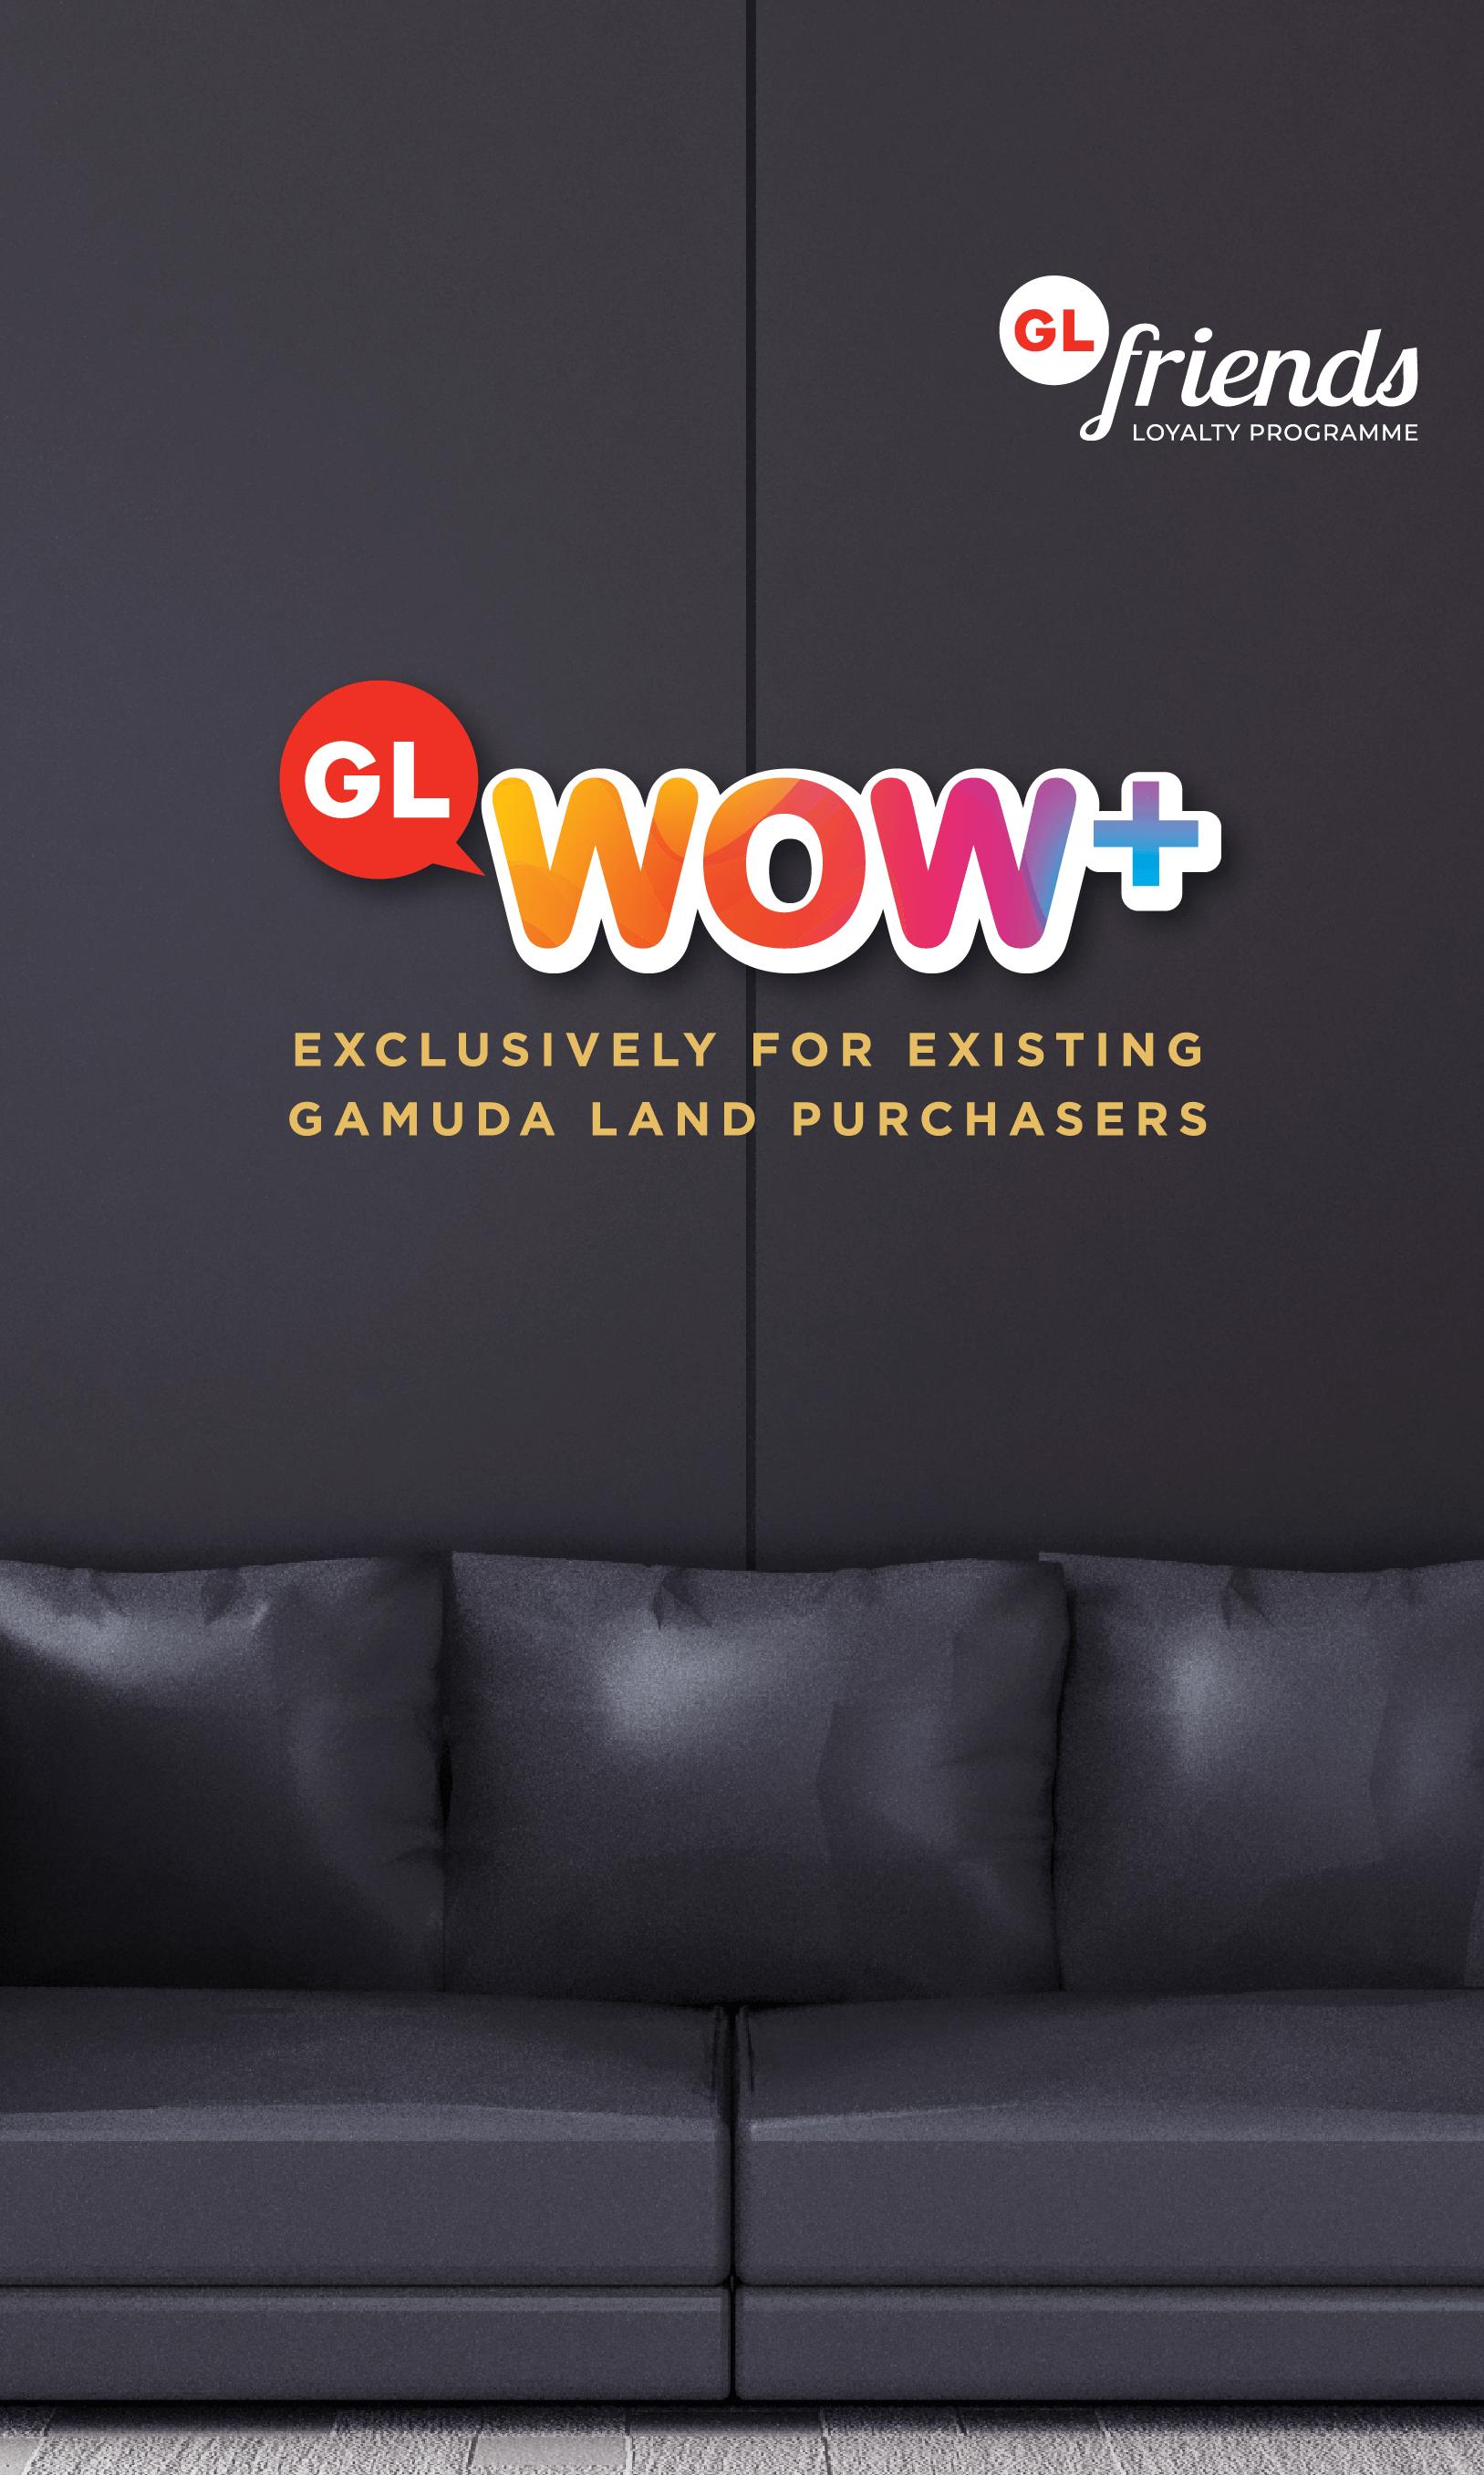 GL WOW+